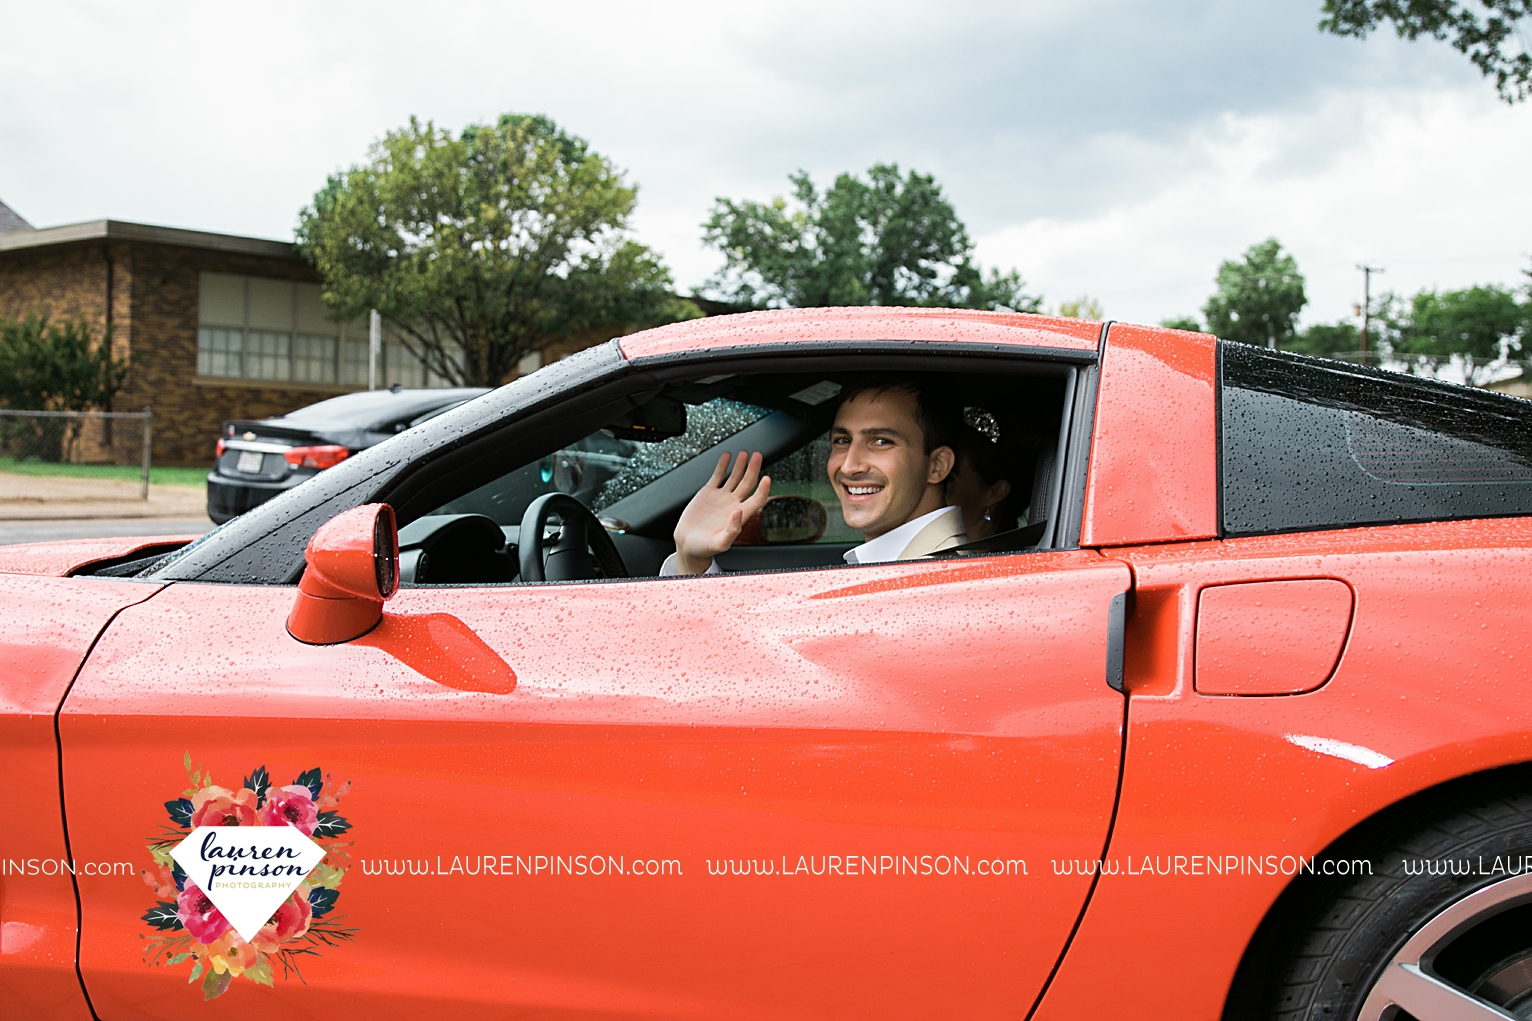 wichita-falls-texas-wedding-photographer-the-forum-by-the-kemp-mayfield-events-ulta-gold-glitter_2885.jpg